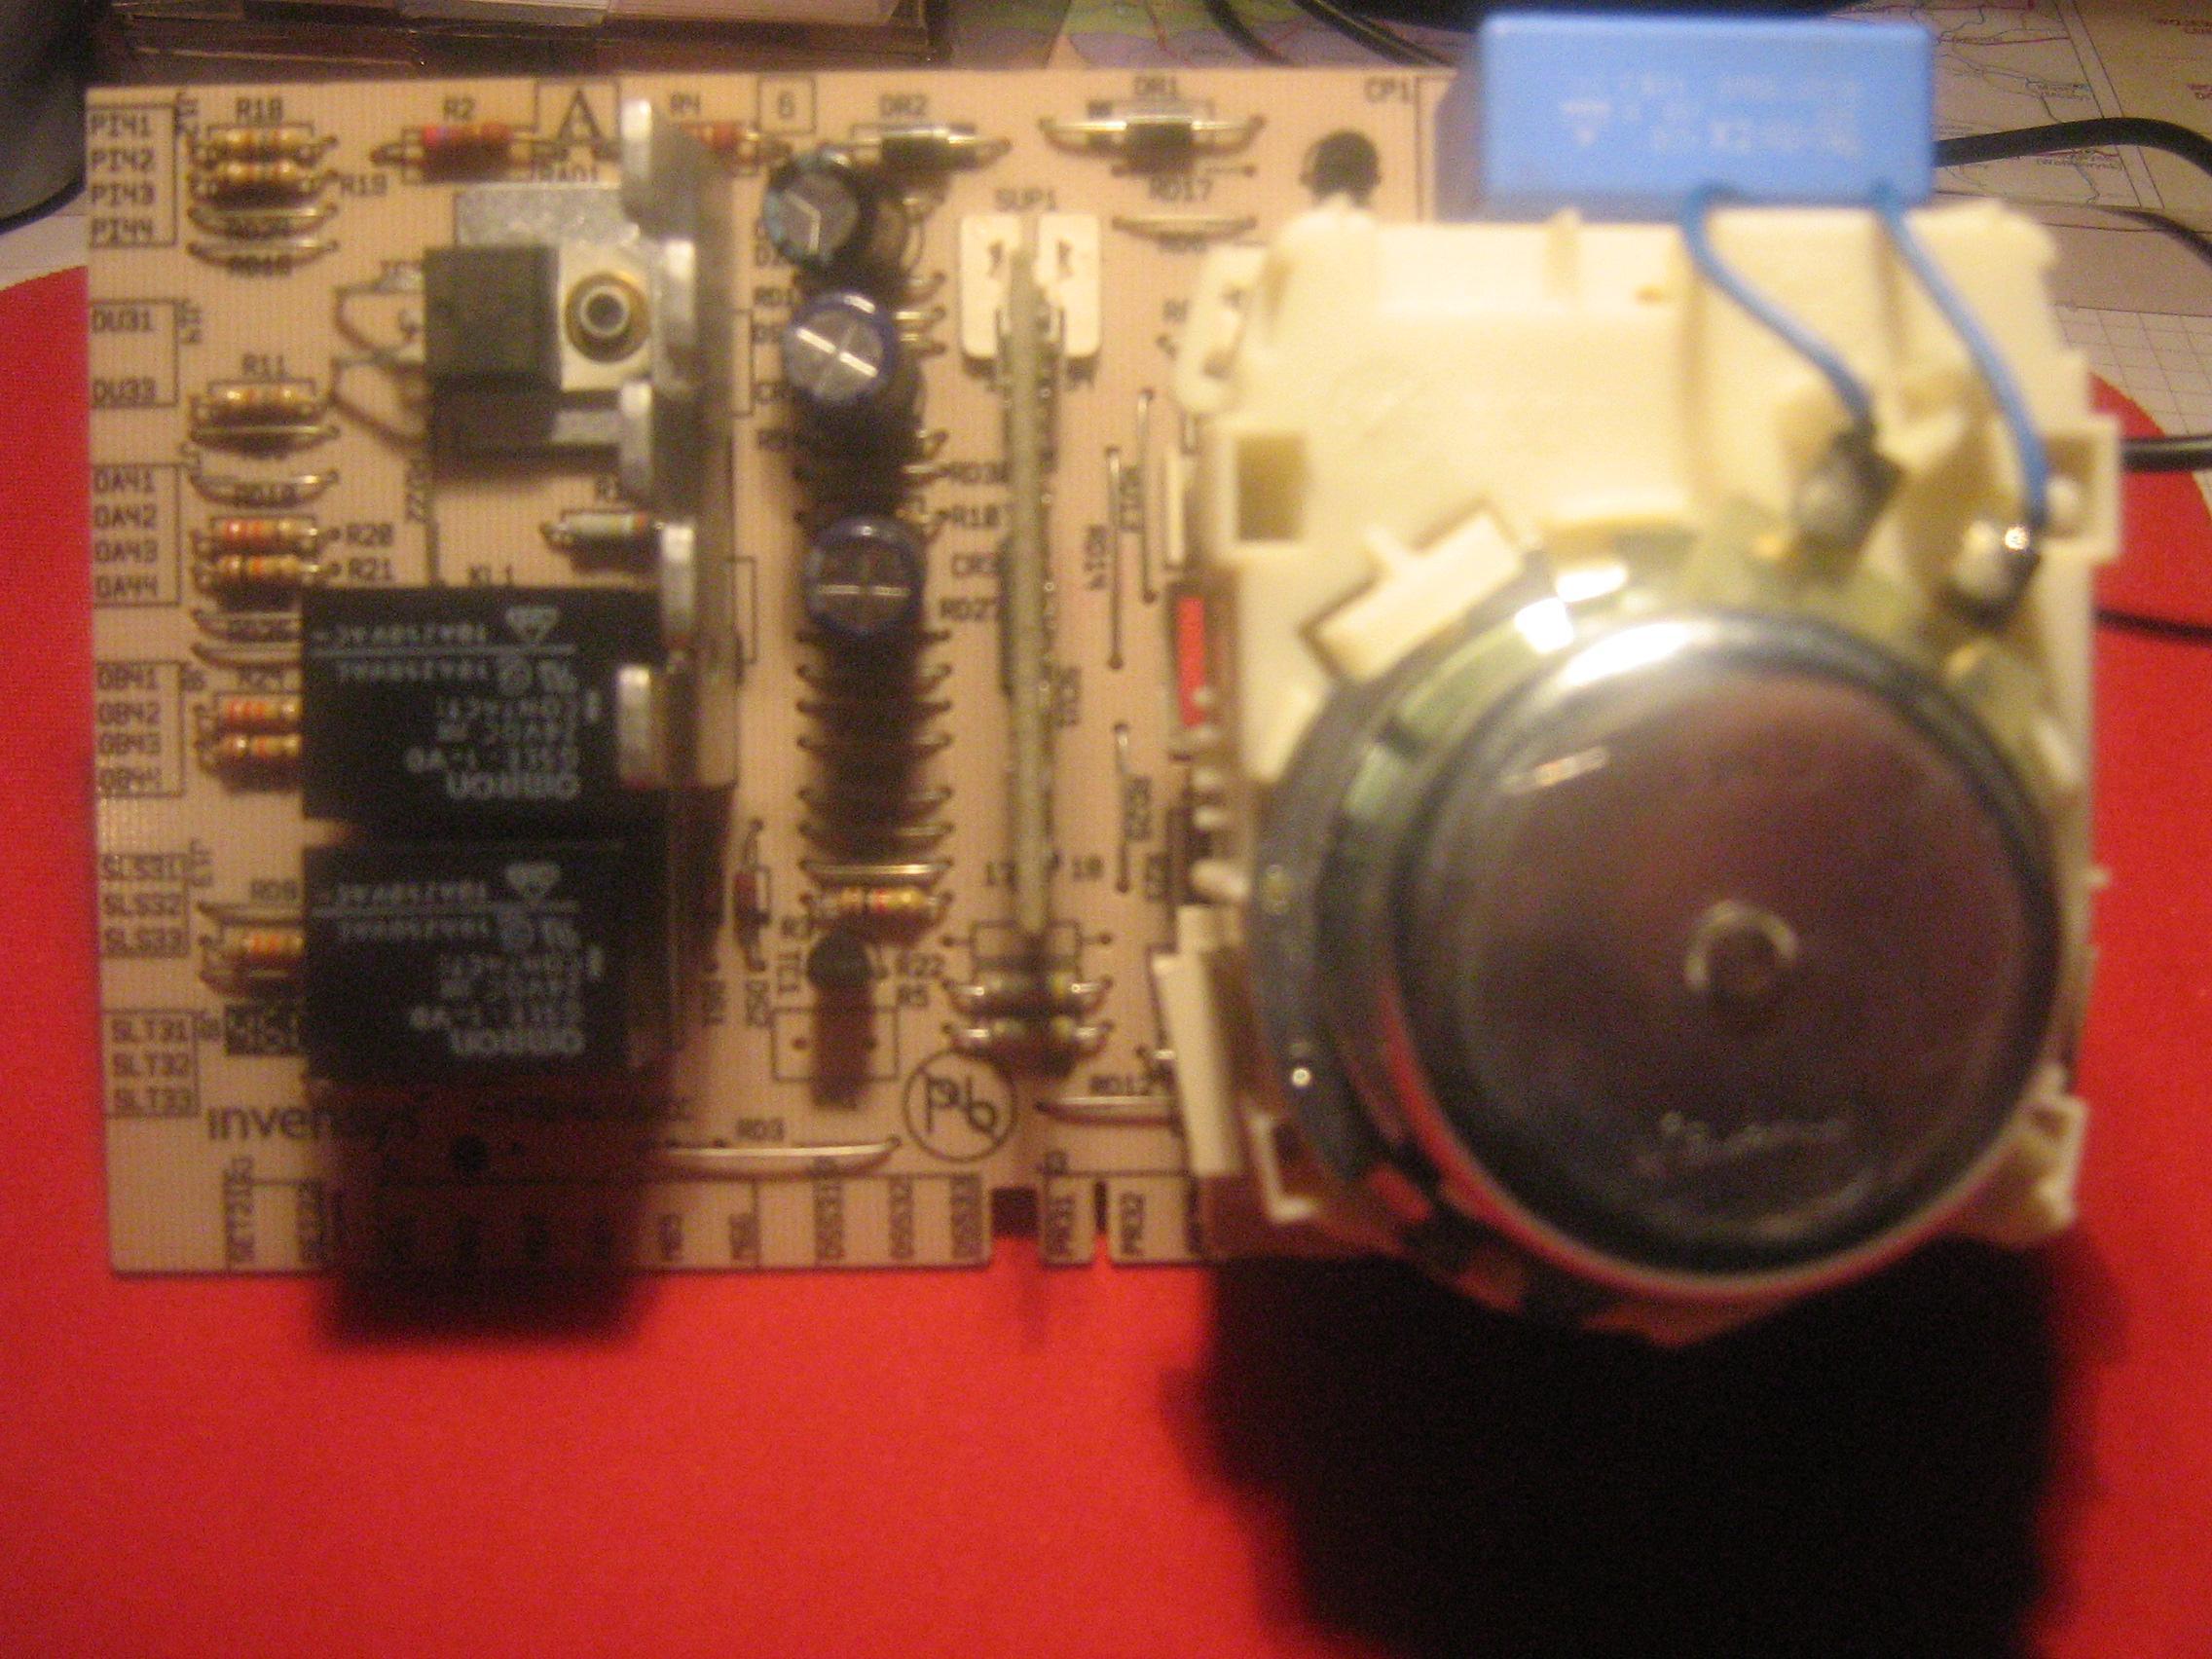 Whirlpool awt 5108 4-1000 схема